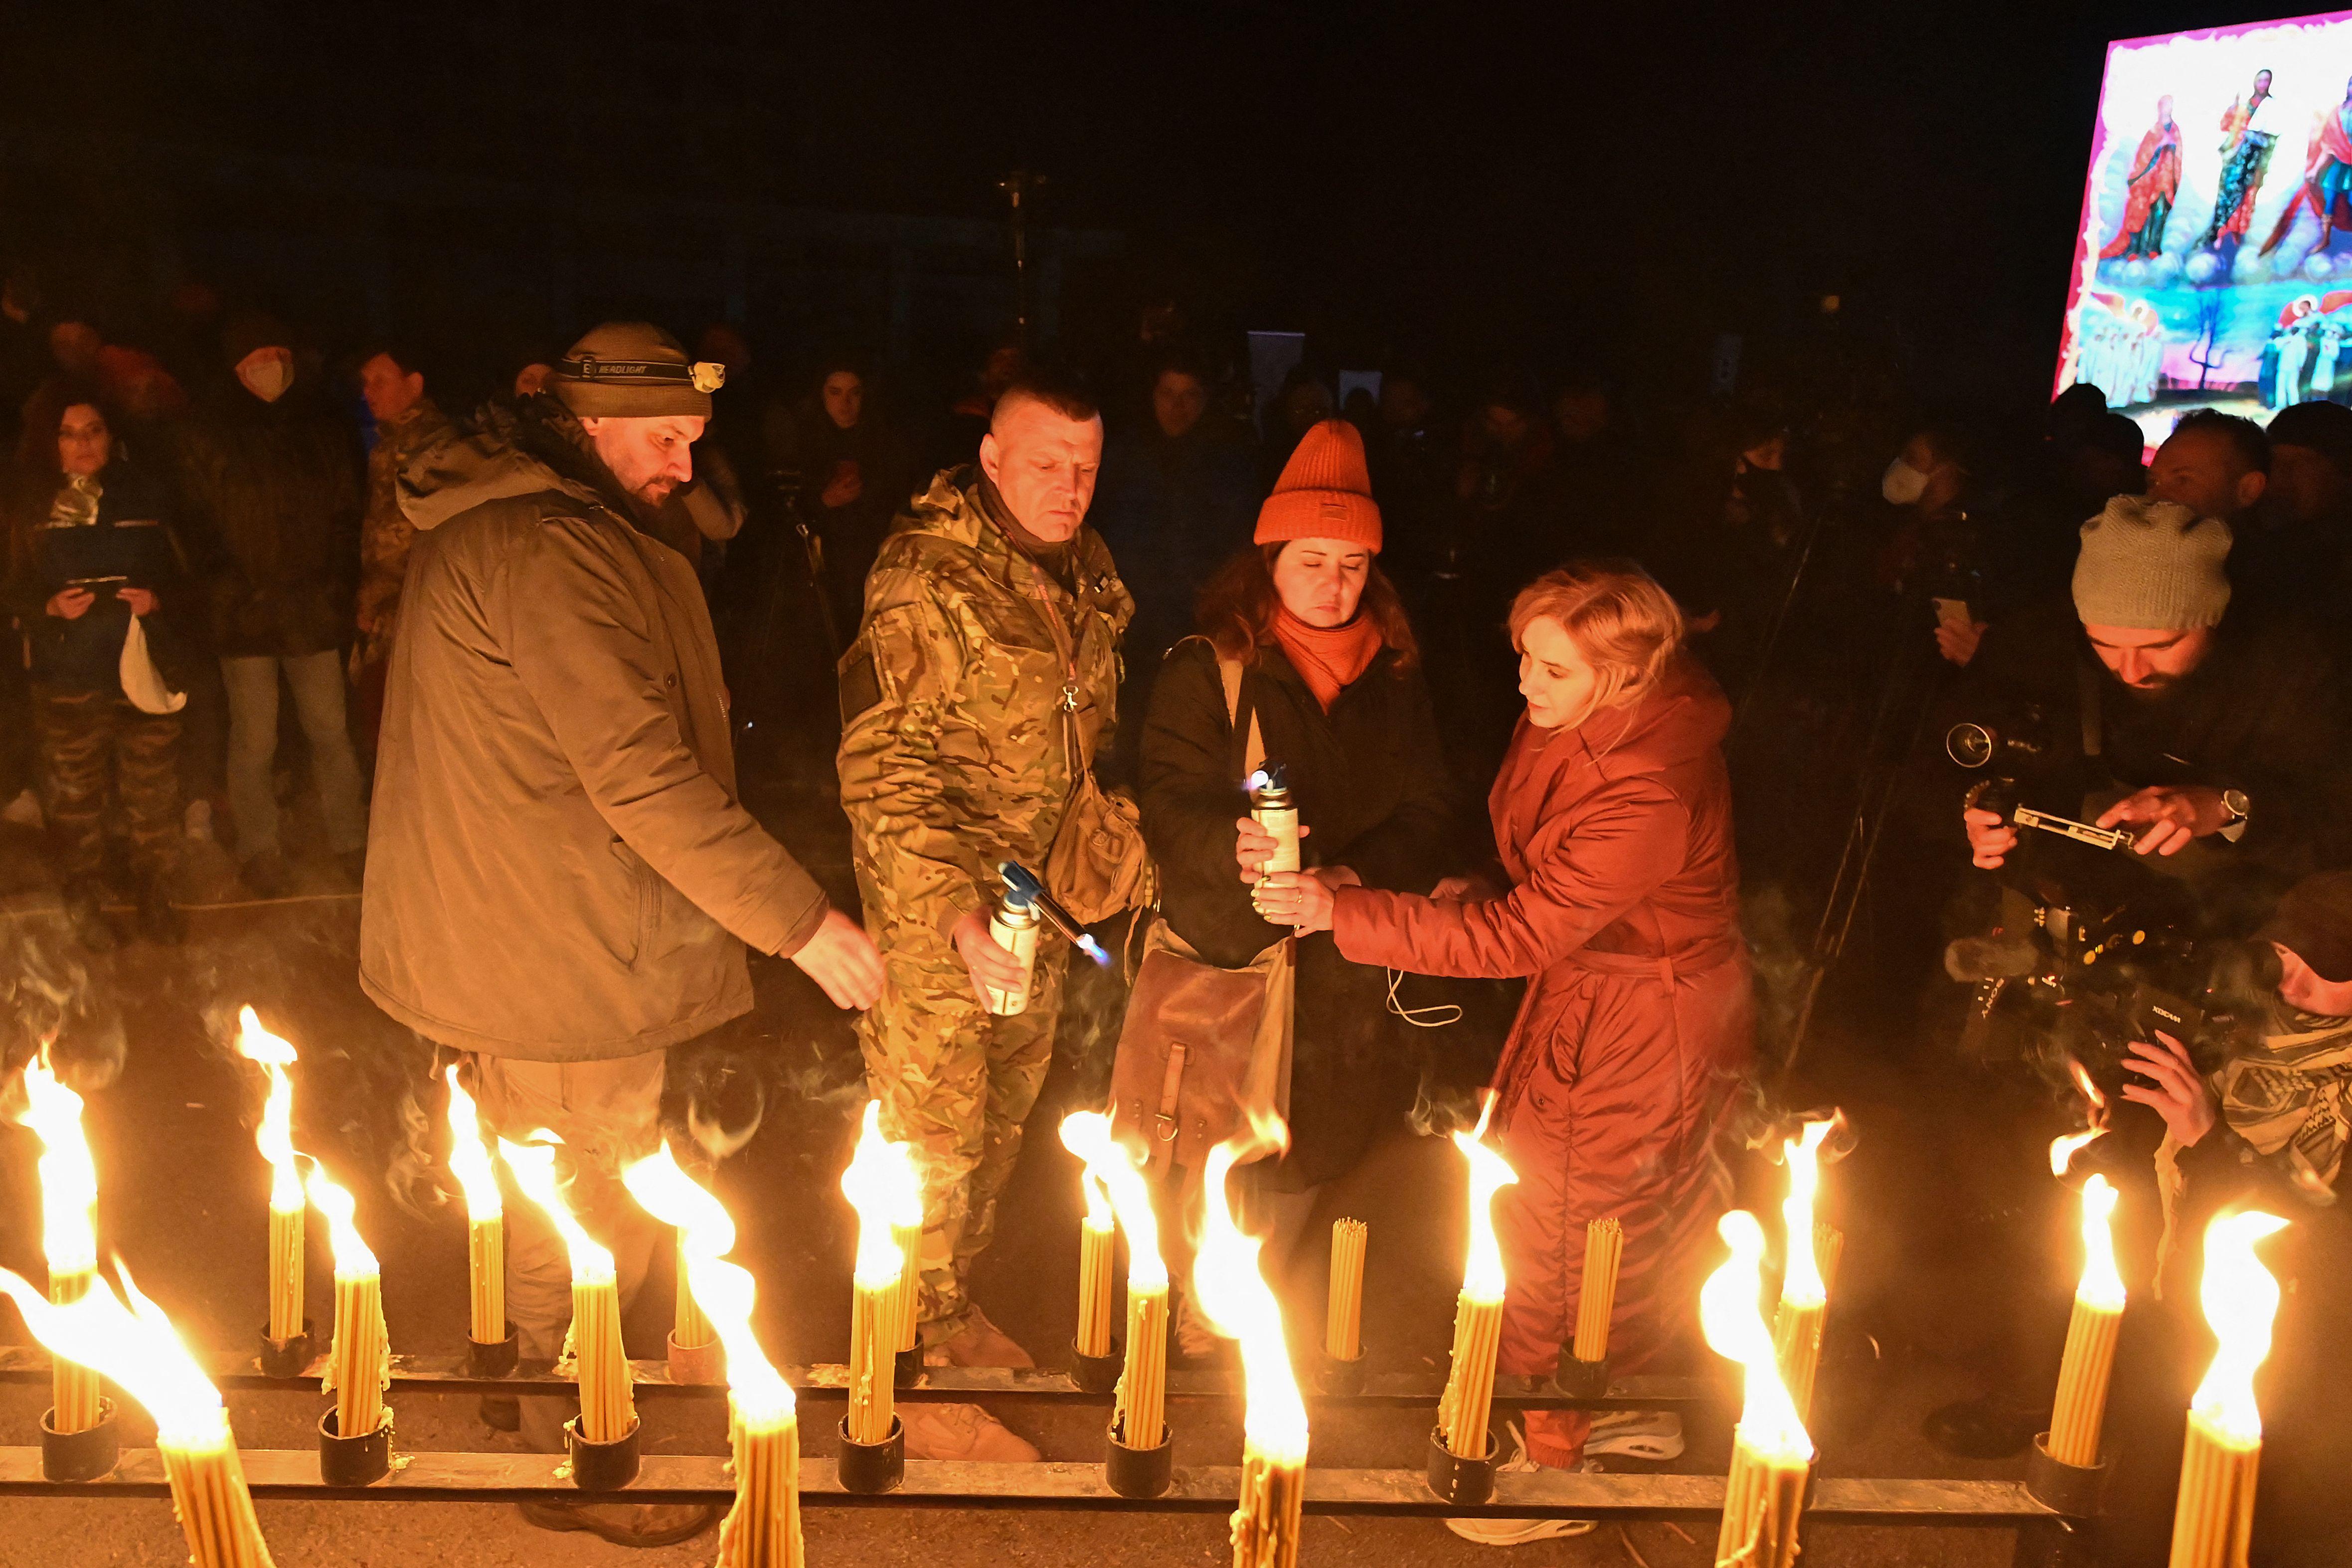 Warga menyalakan lilin di alun-alun pusat kota Pripyat. Foto: Genya Savilov/AFP